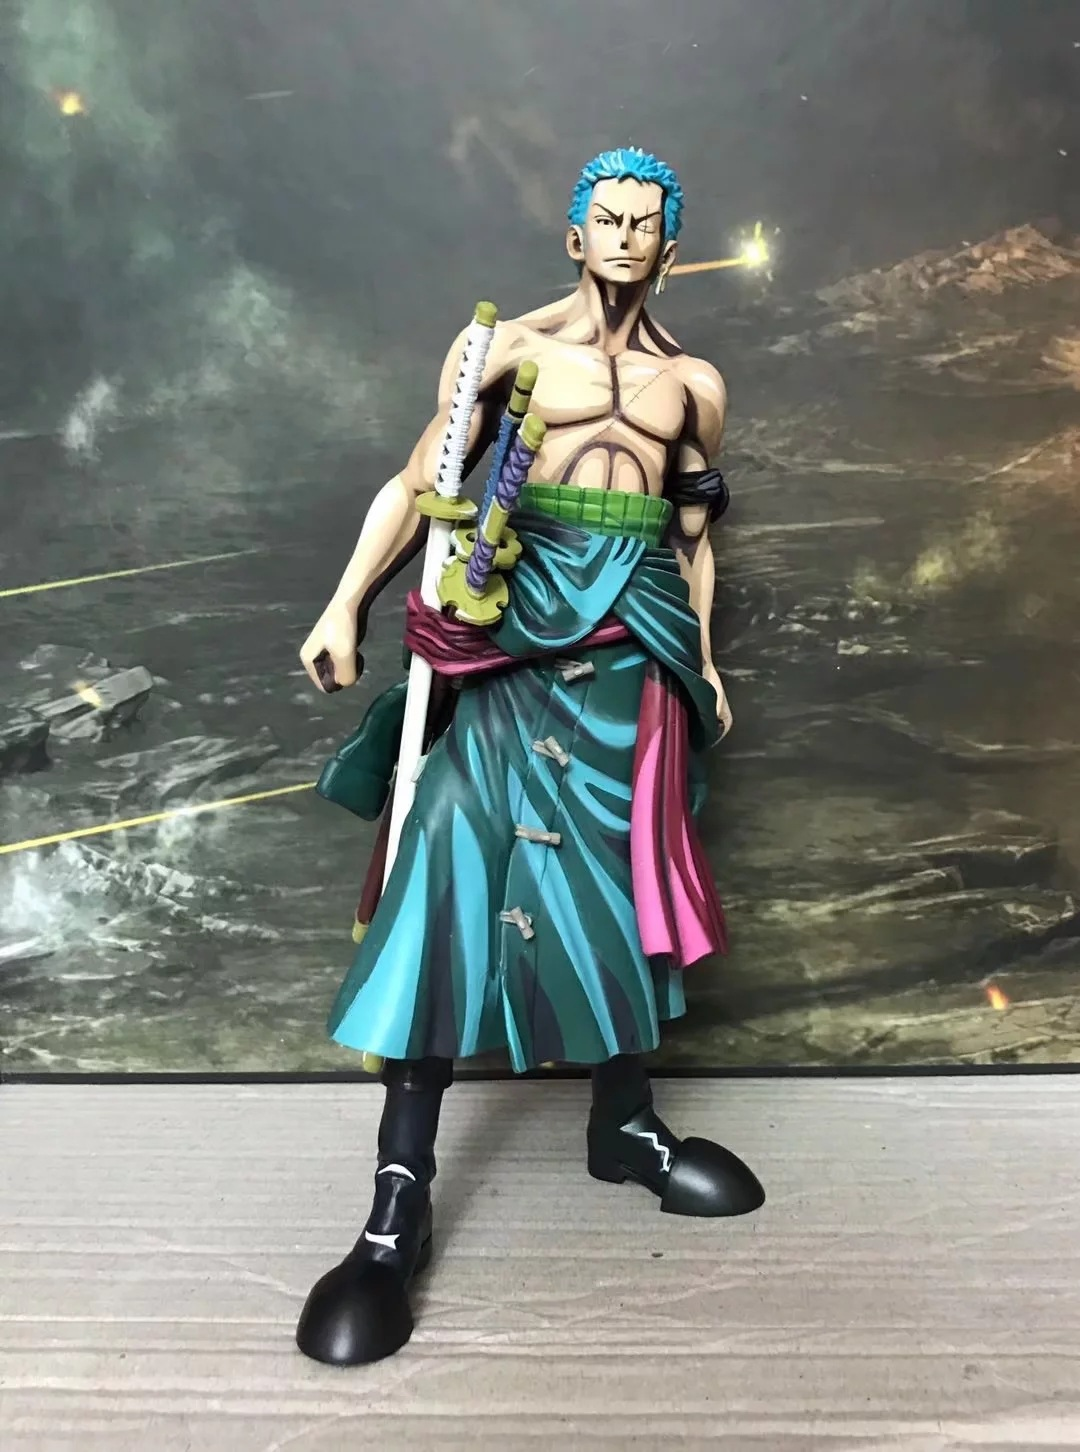 US $24 48 OFF Anime e Piece Ver Roronoa Zoro Action Figure asi Yang Straw Hat Pirates PVC gambar Toy 25 CM di Aksi & Toy Angka dari Mainan &